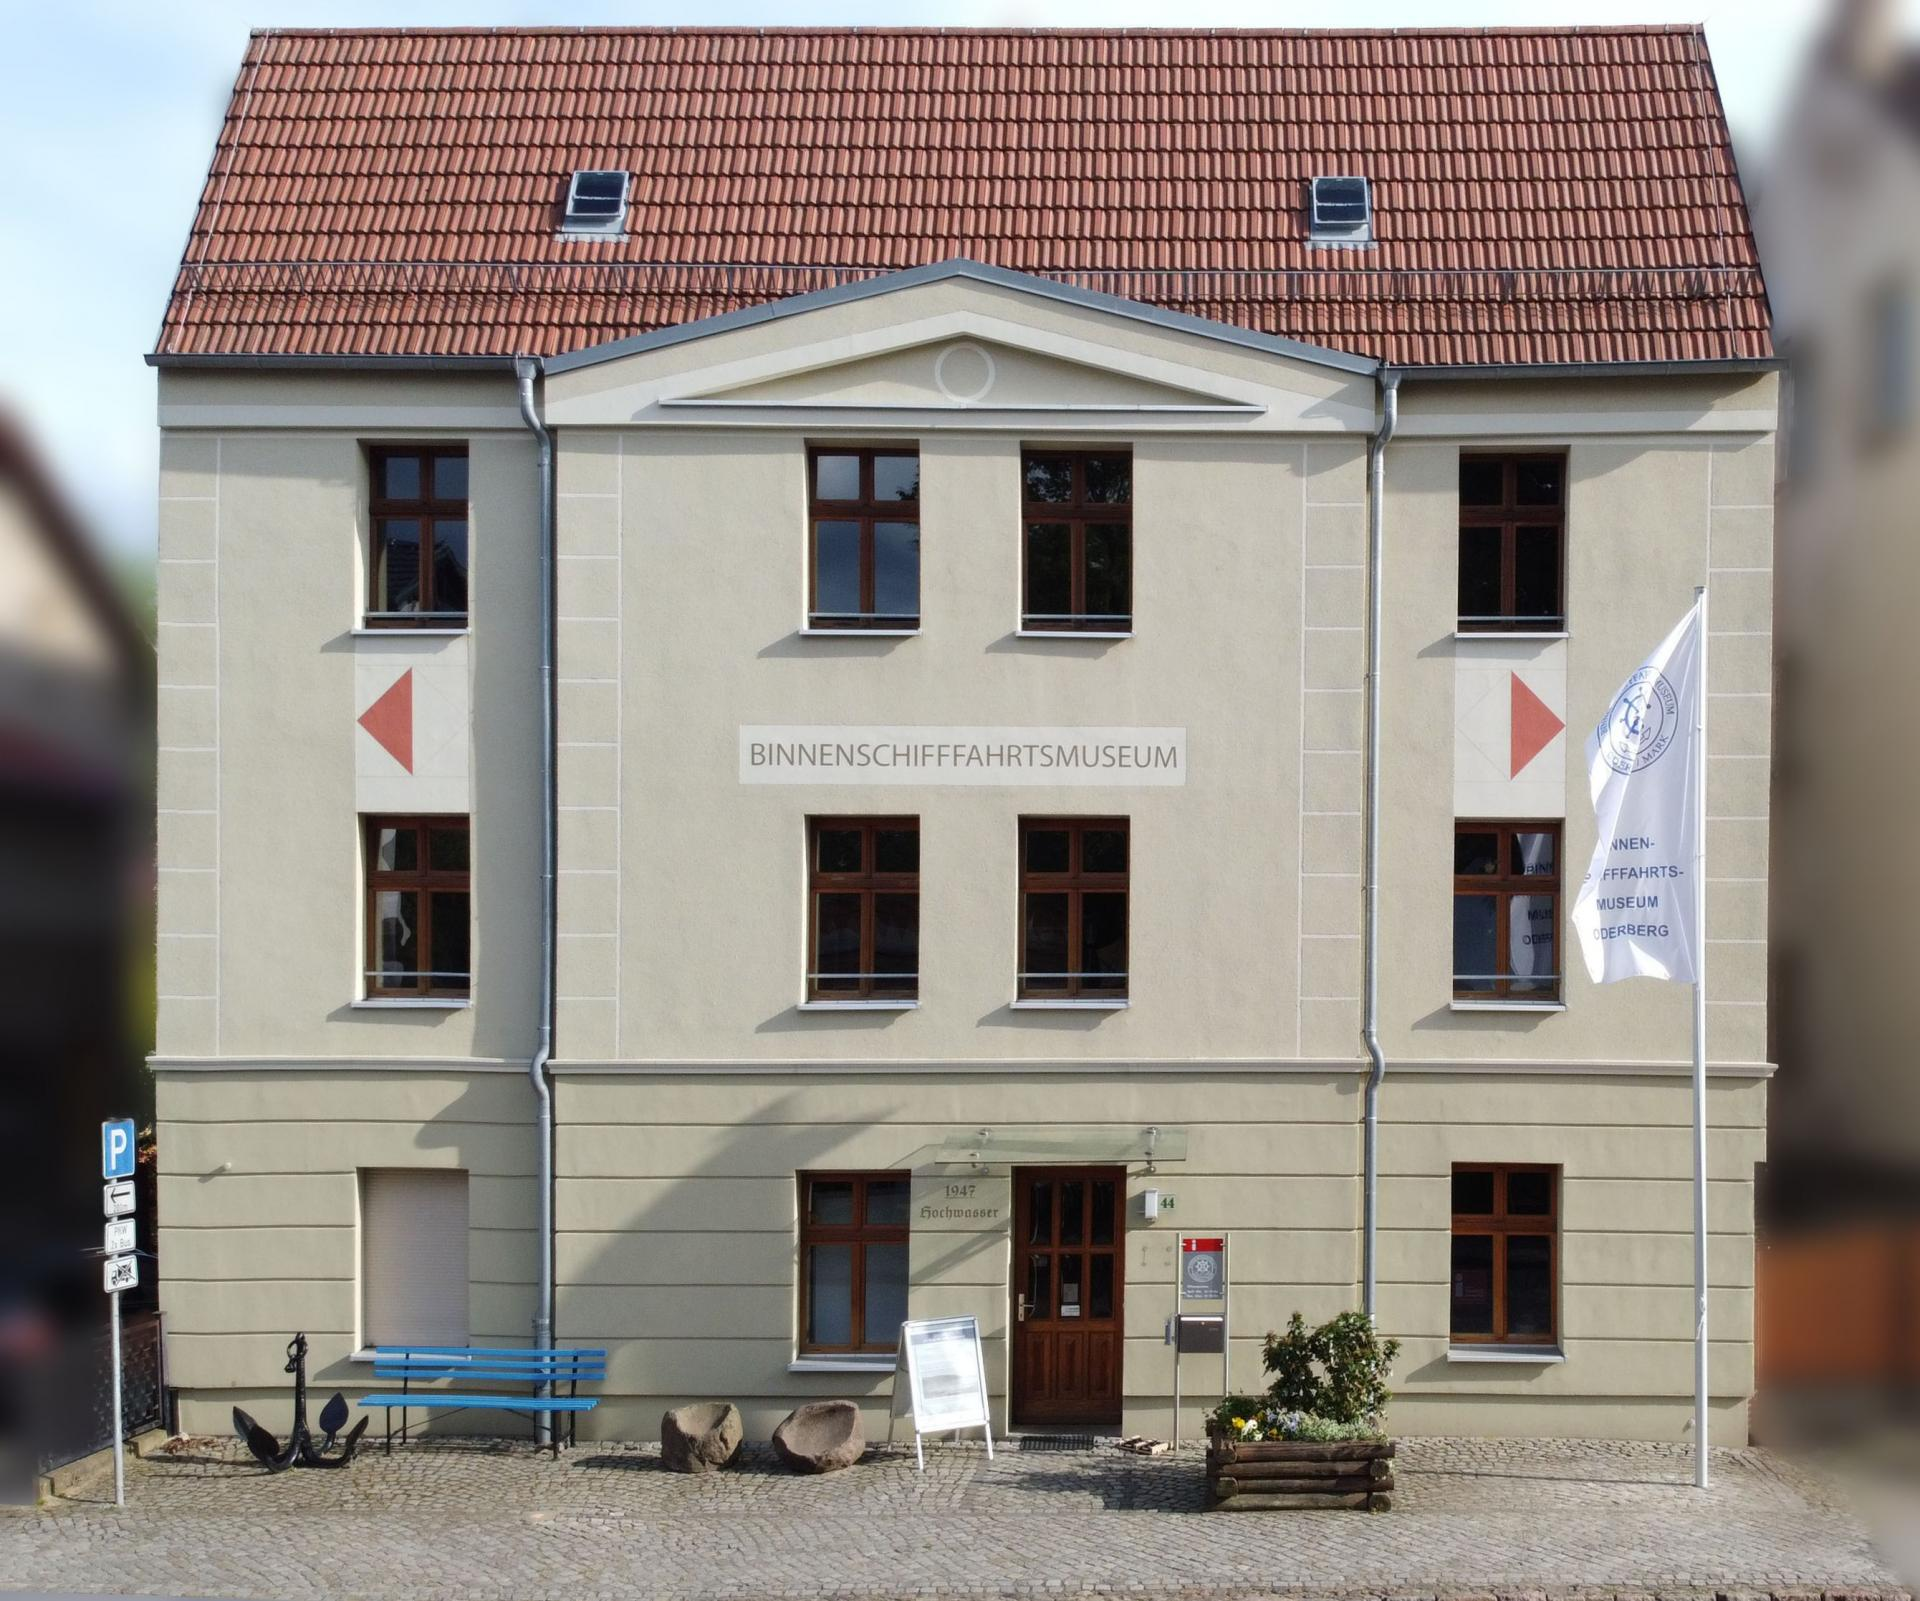 Museum Oderberg